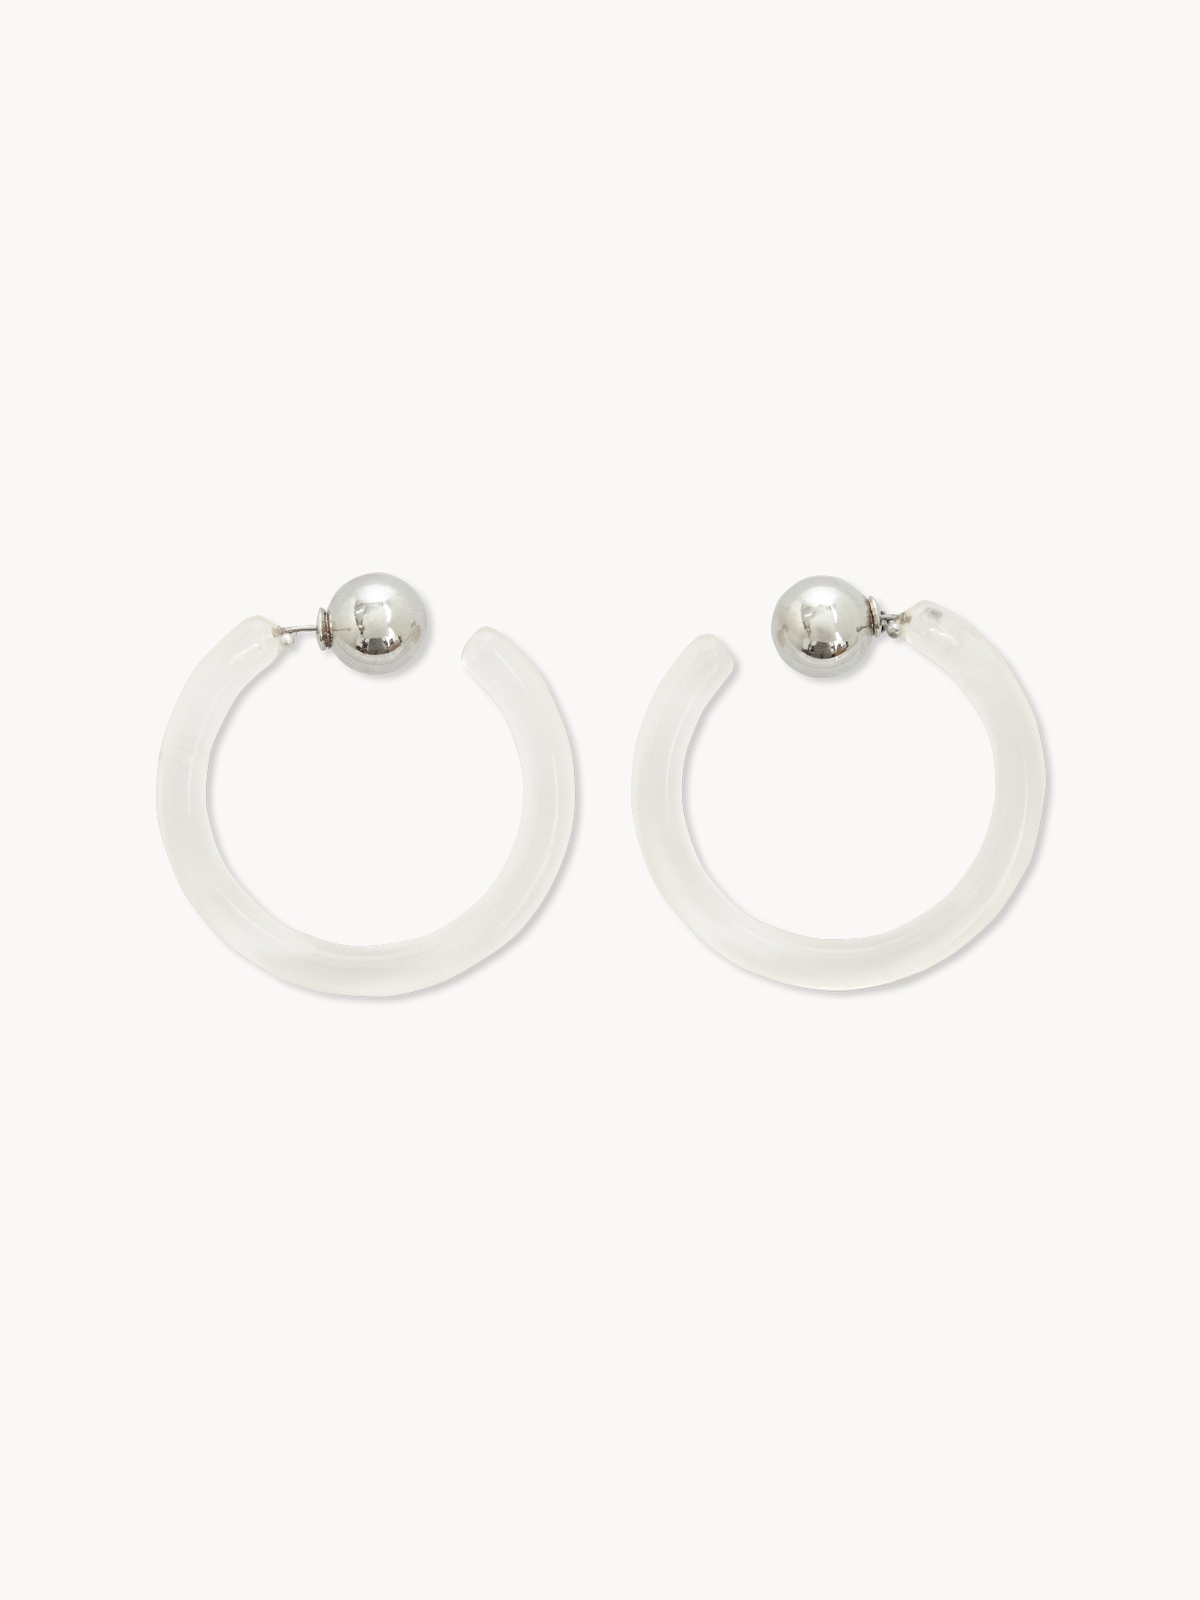 Clear Acrylic Circular Hoop Earrings Silver